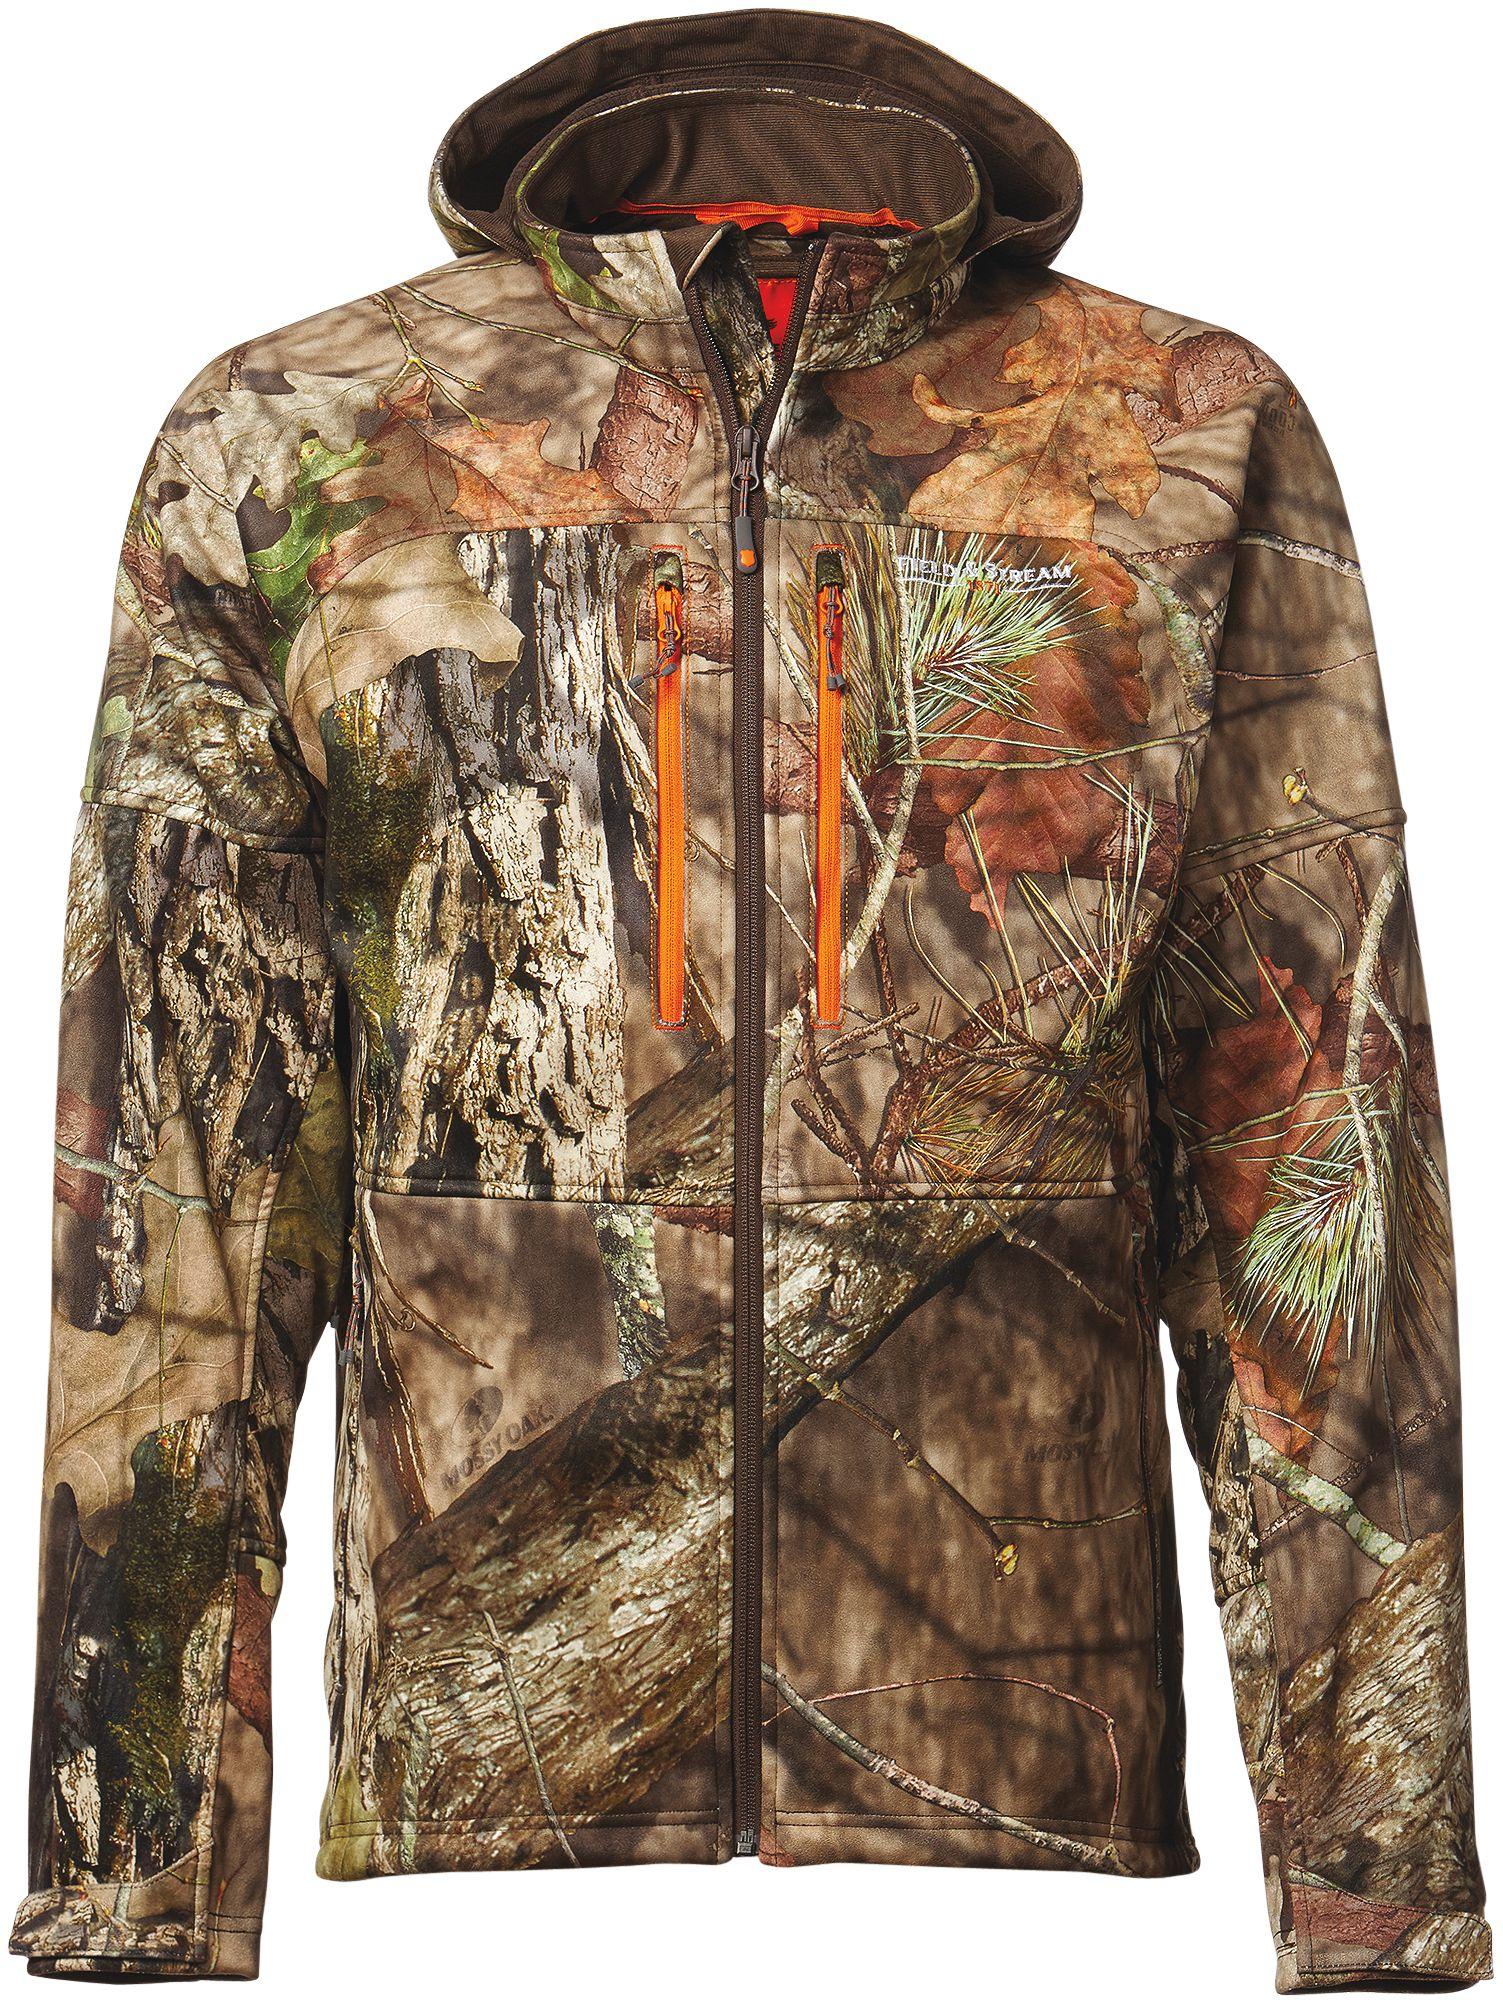 Field & Stream Men's Triumph Softshell Hunting Jacket, Size: Medium, Brown thumbnail